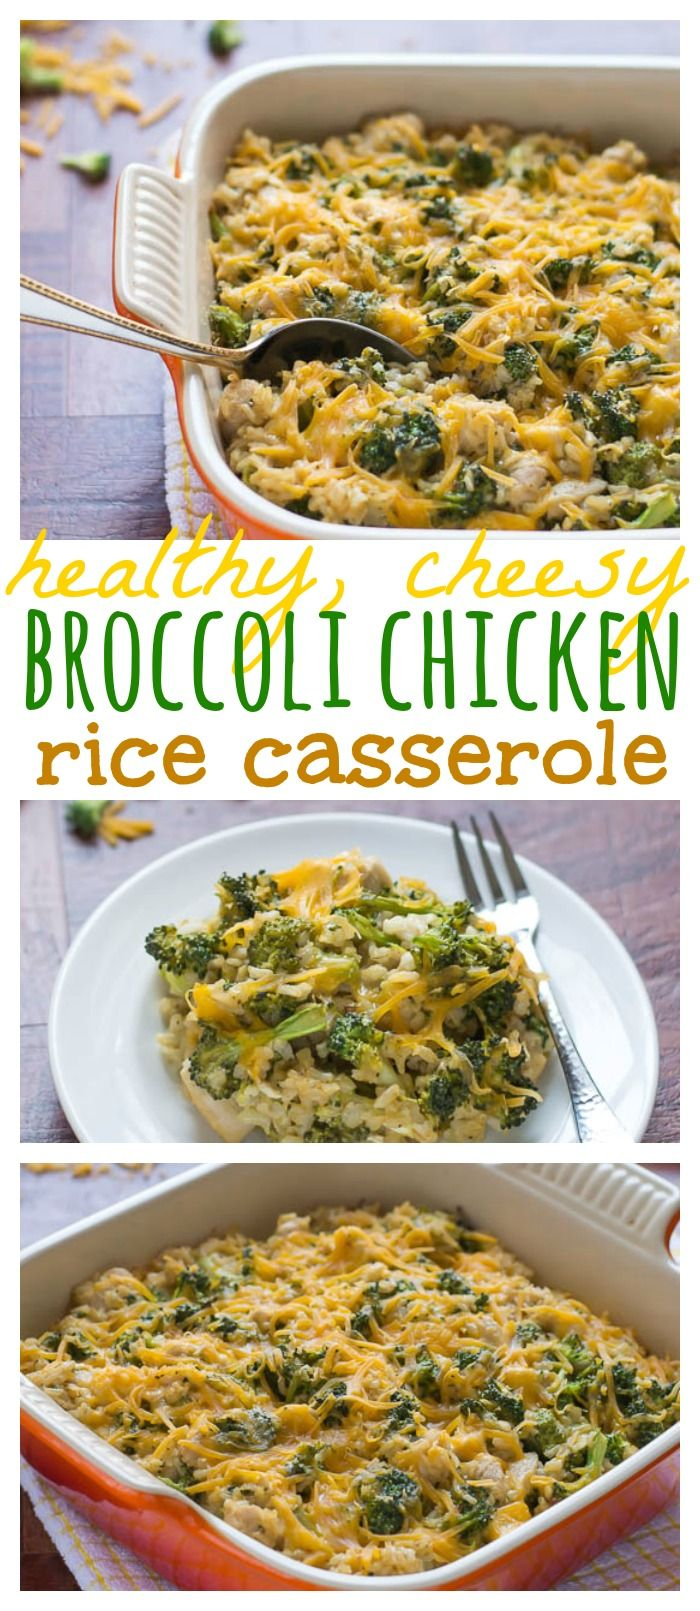 Healthy, Cheesy Broccoli Chicken Rice Casserole  Well -2974